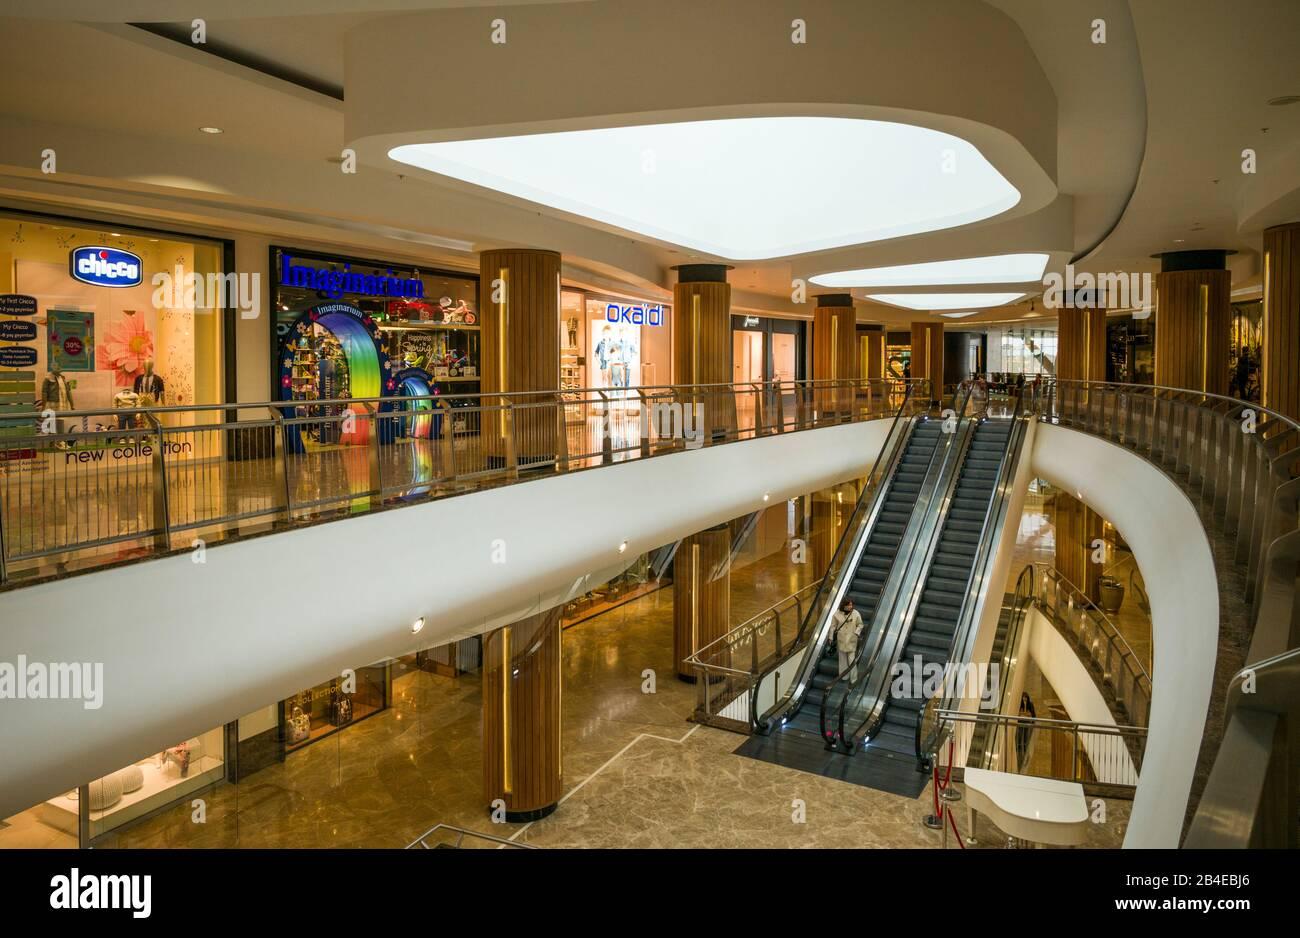 Azerbaijan Baku Port Baku Mall Interior Stock Photo Alamy